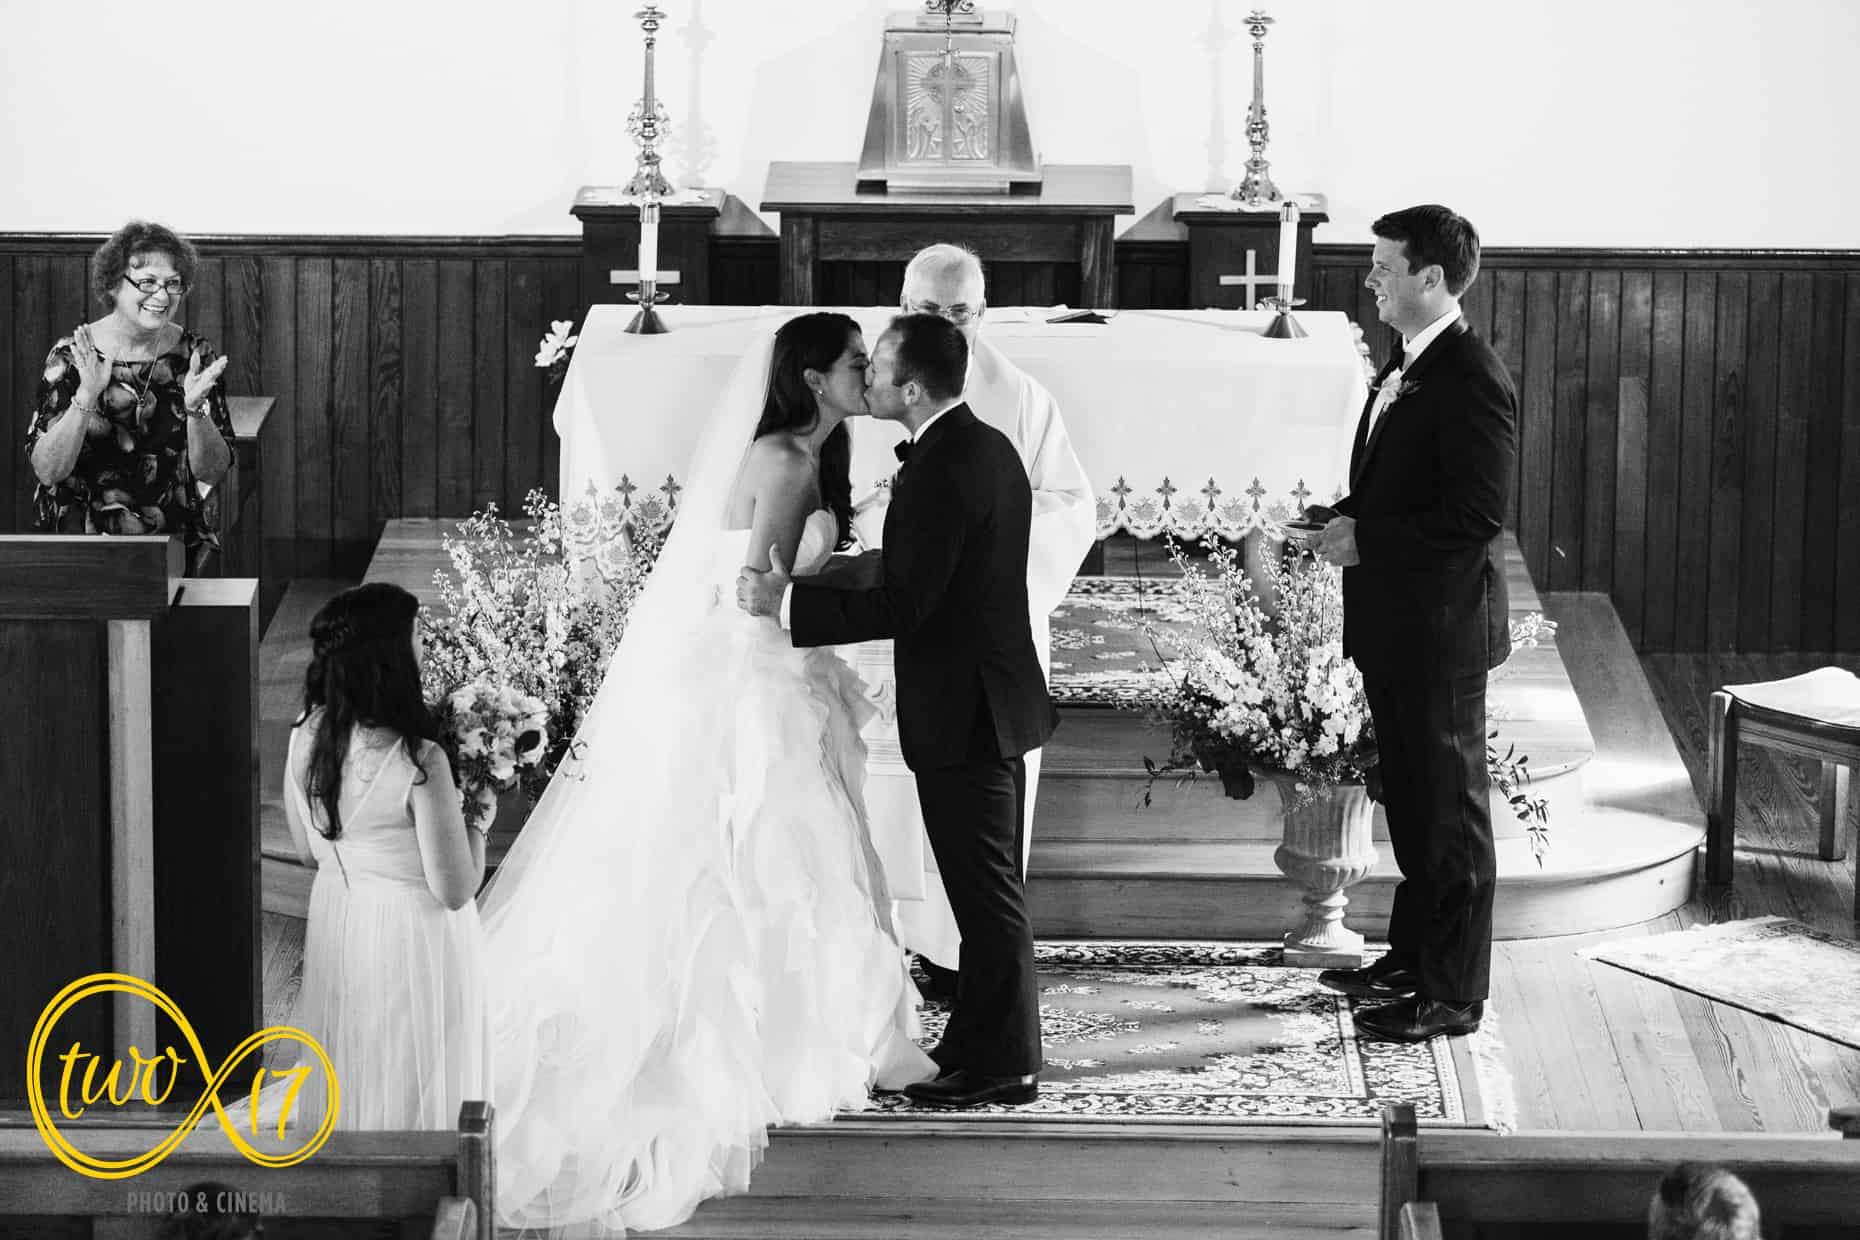 Willow Creek Winery Wedding Photographer